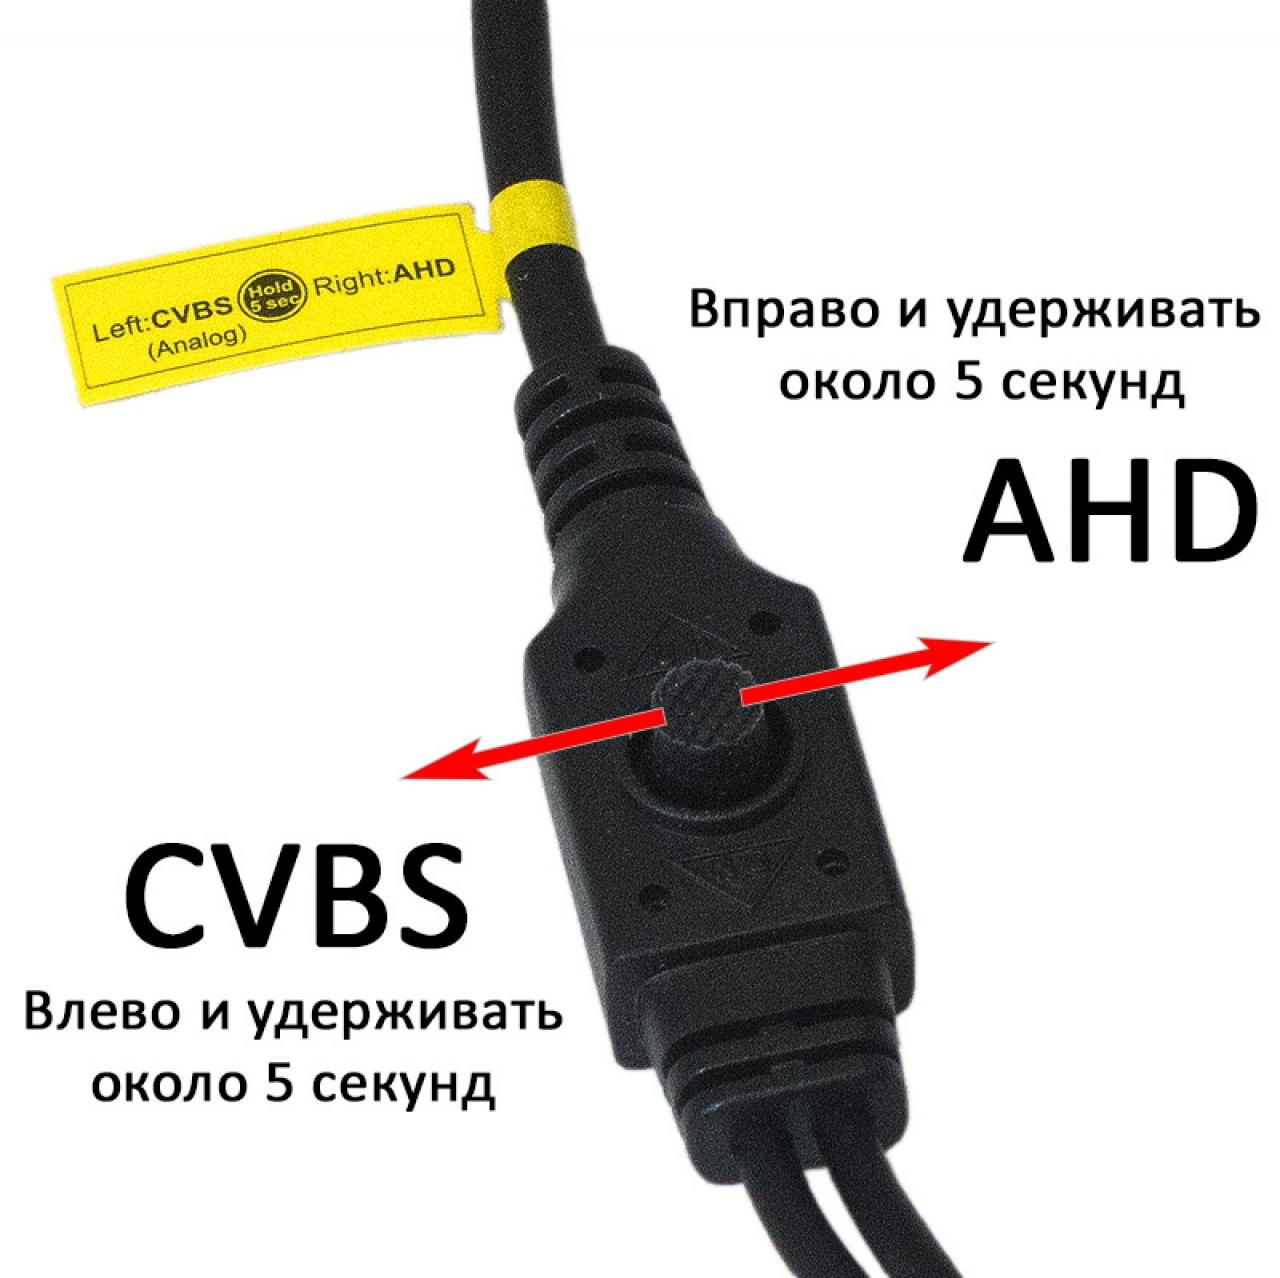 Перевод АШД в аналог